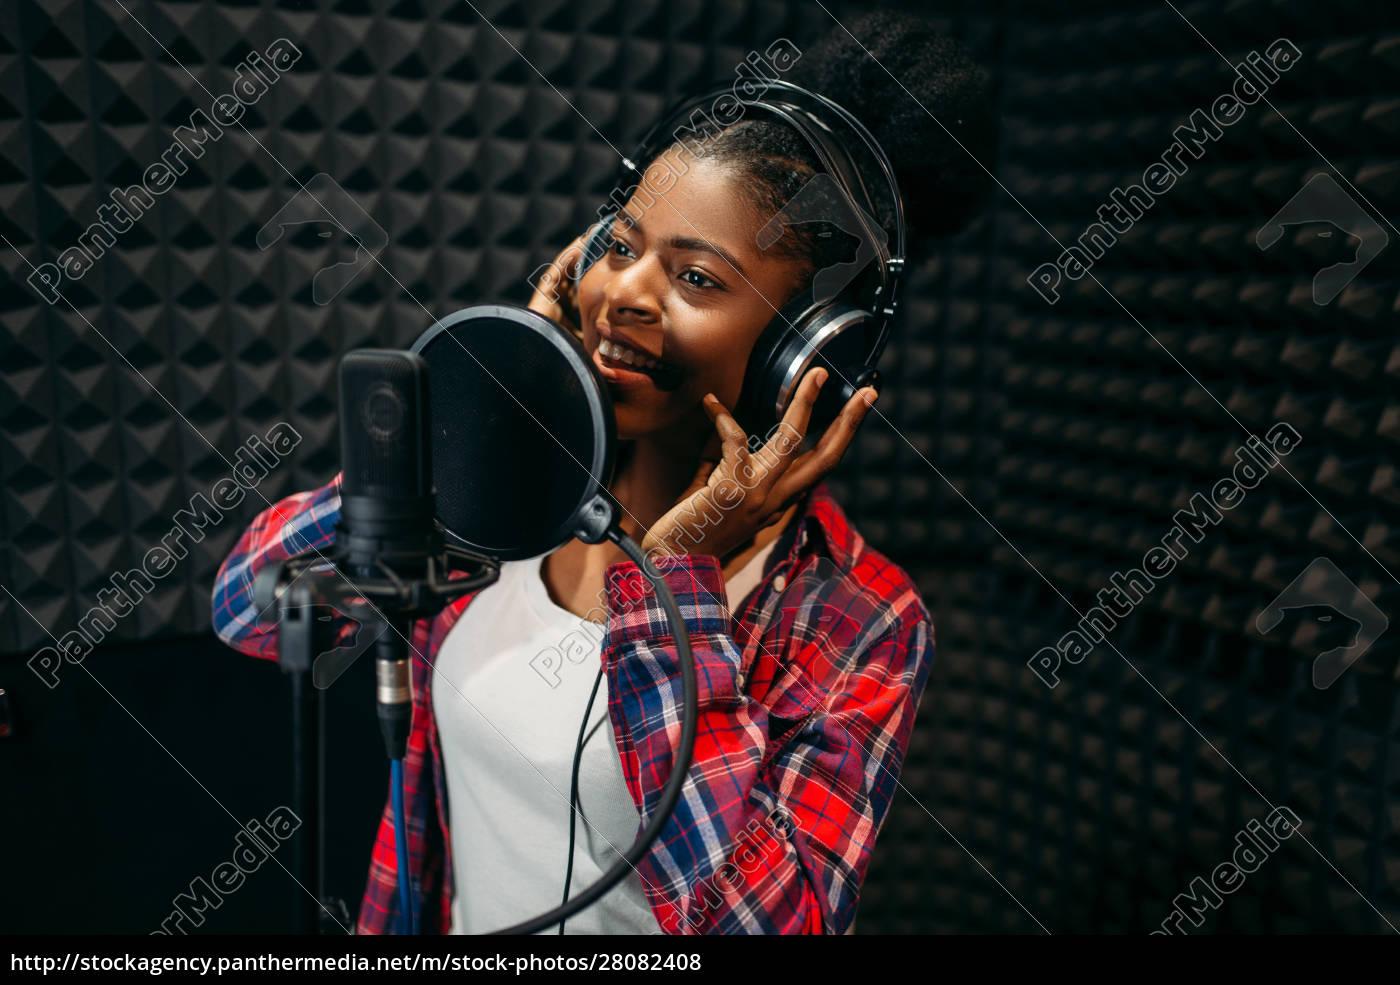 female, performer, songs, in, audio, recording - 28082408